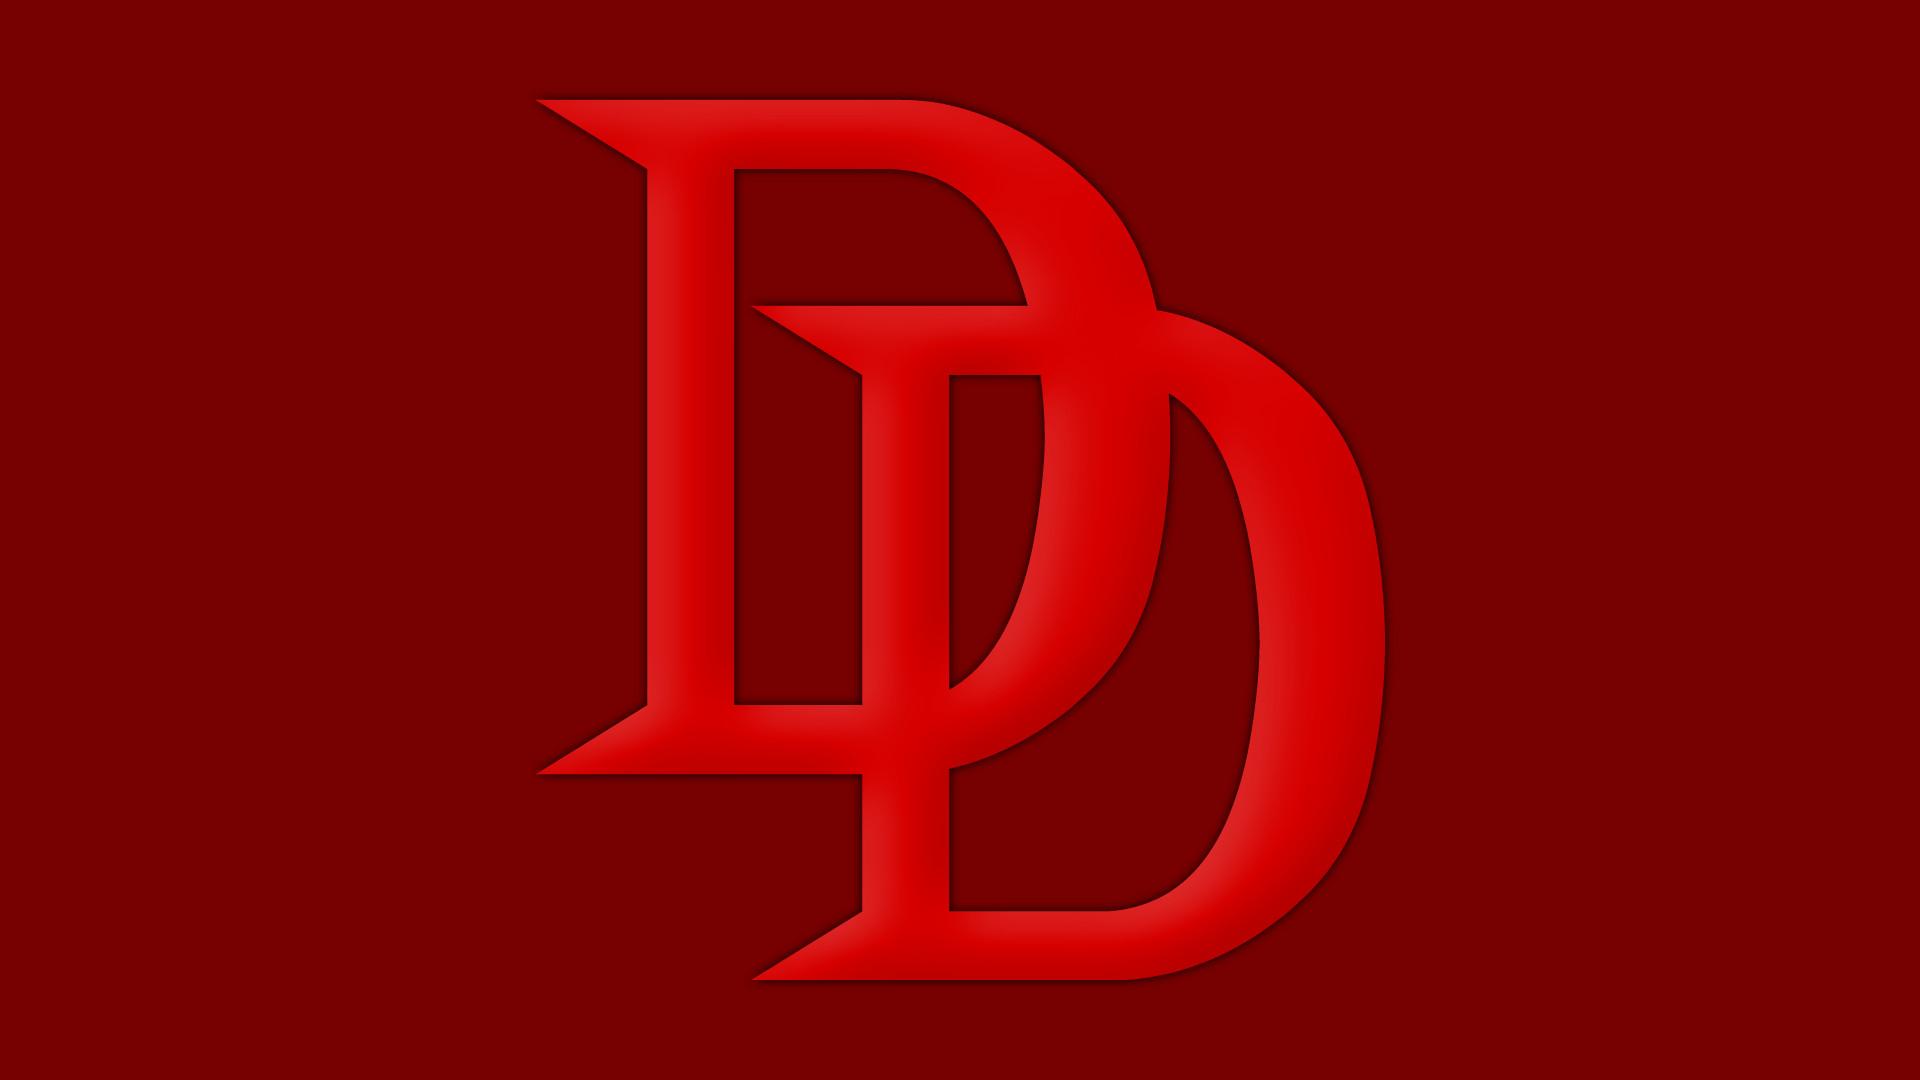 Daredevil Symbol by Yurtigo Daredevil Symbol by Yurtigo